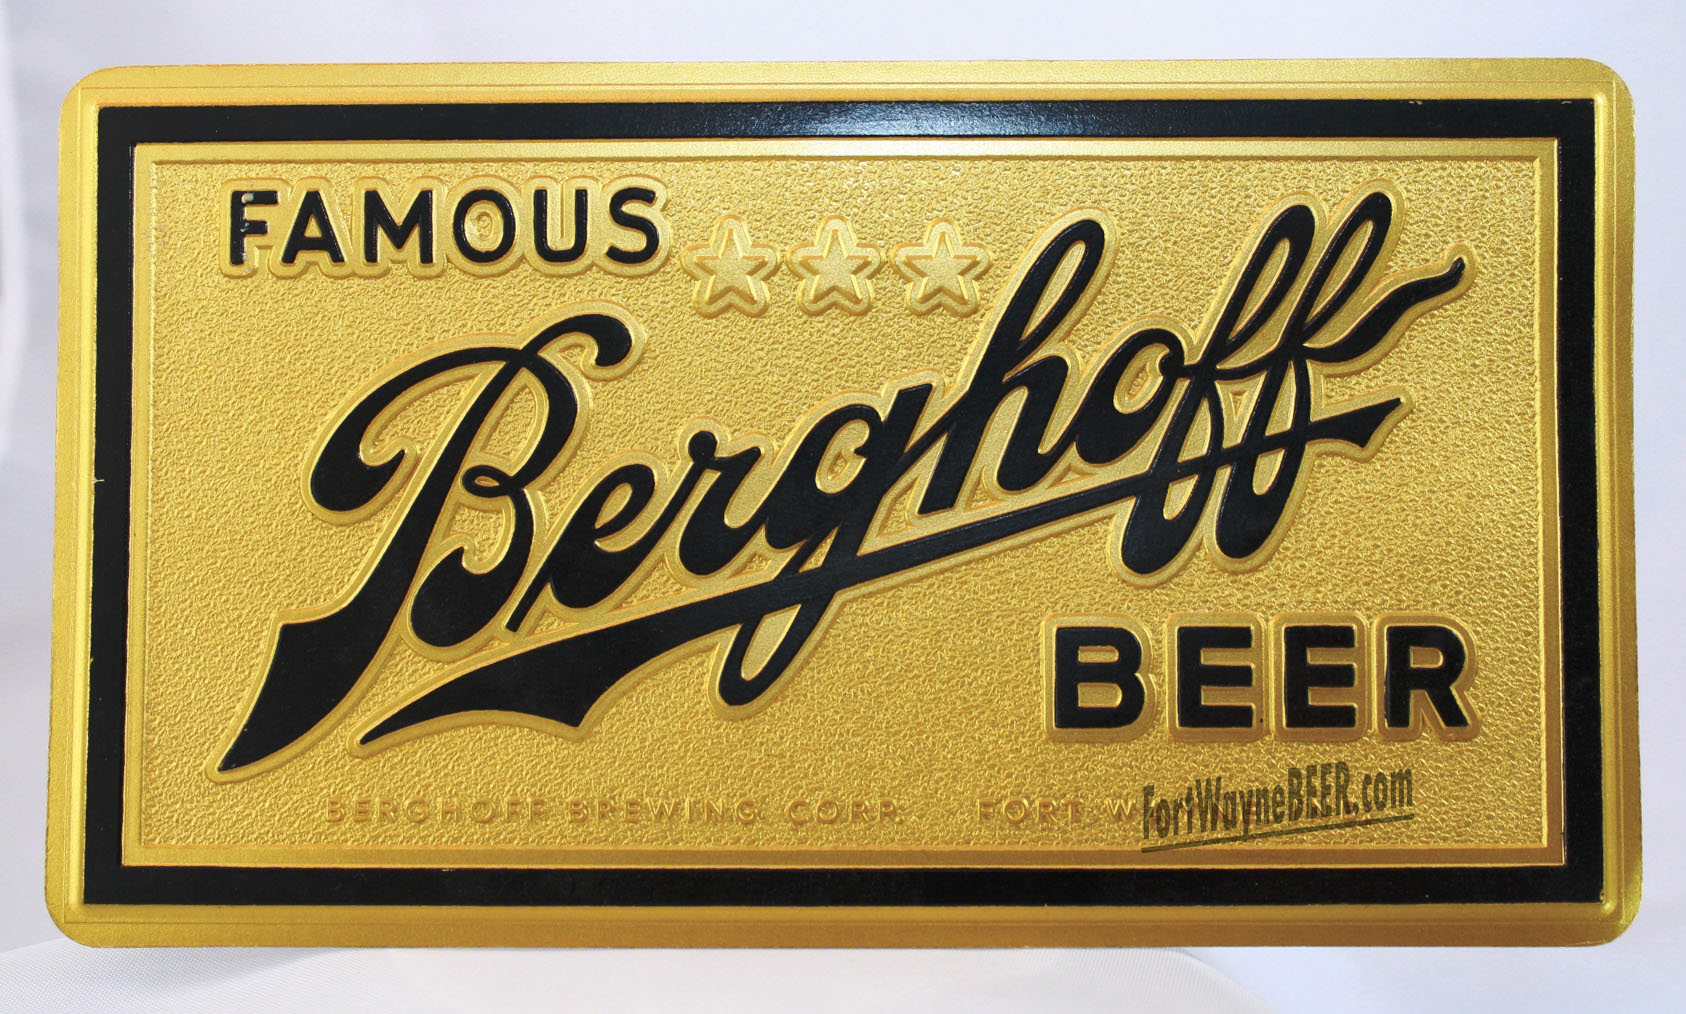 Berghoff sign 1 copy.jpg